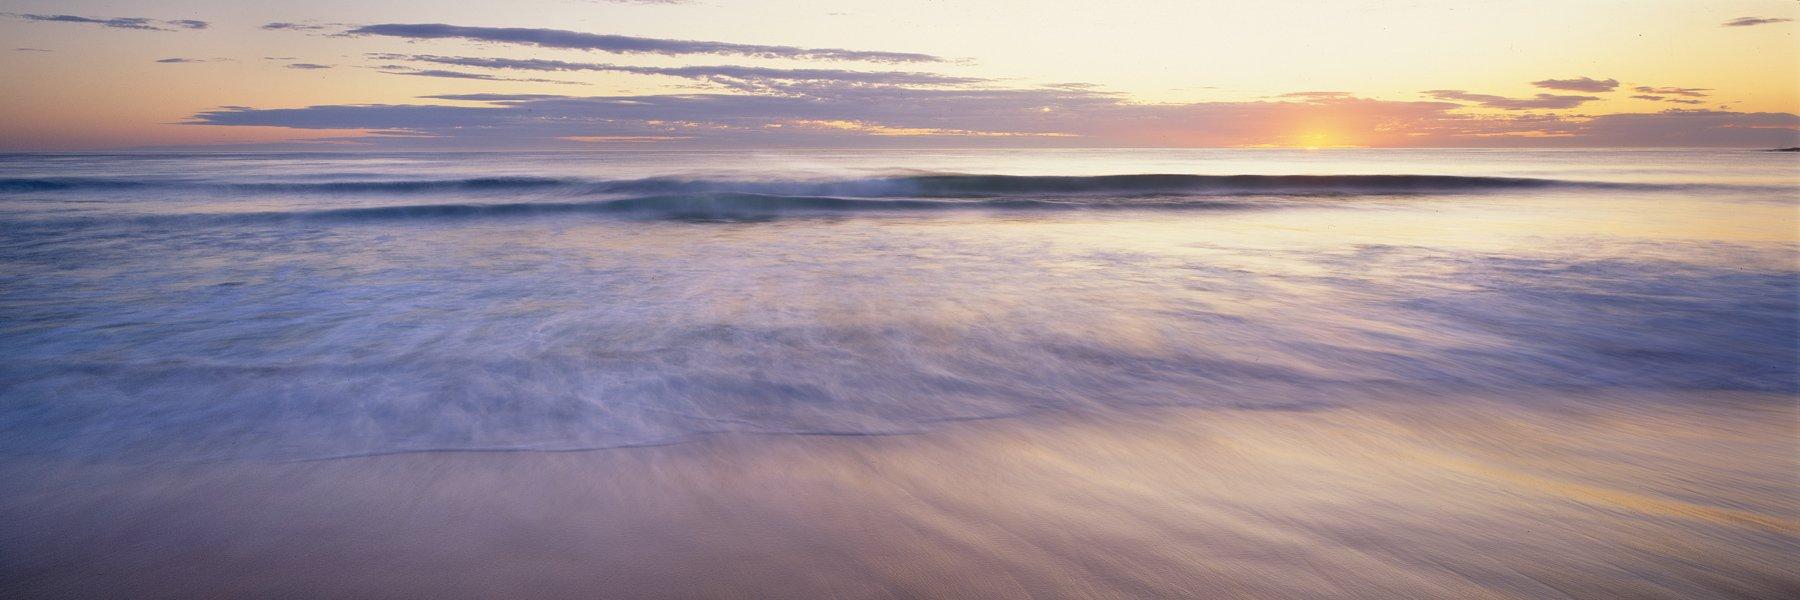 A pastel sunrise over a remote beach, NSW, Australia.